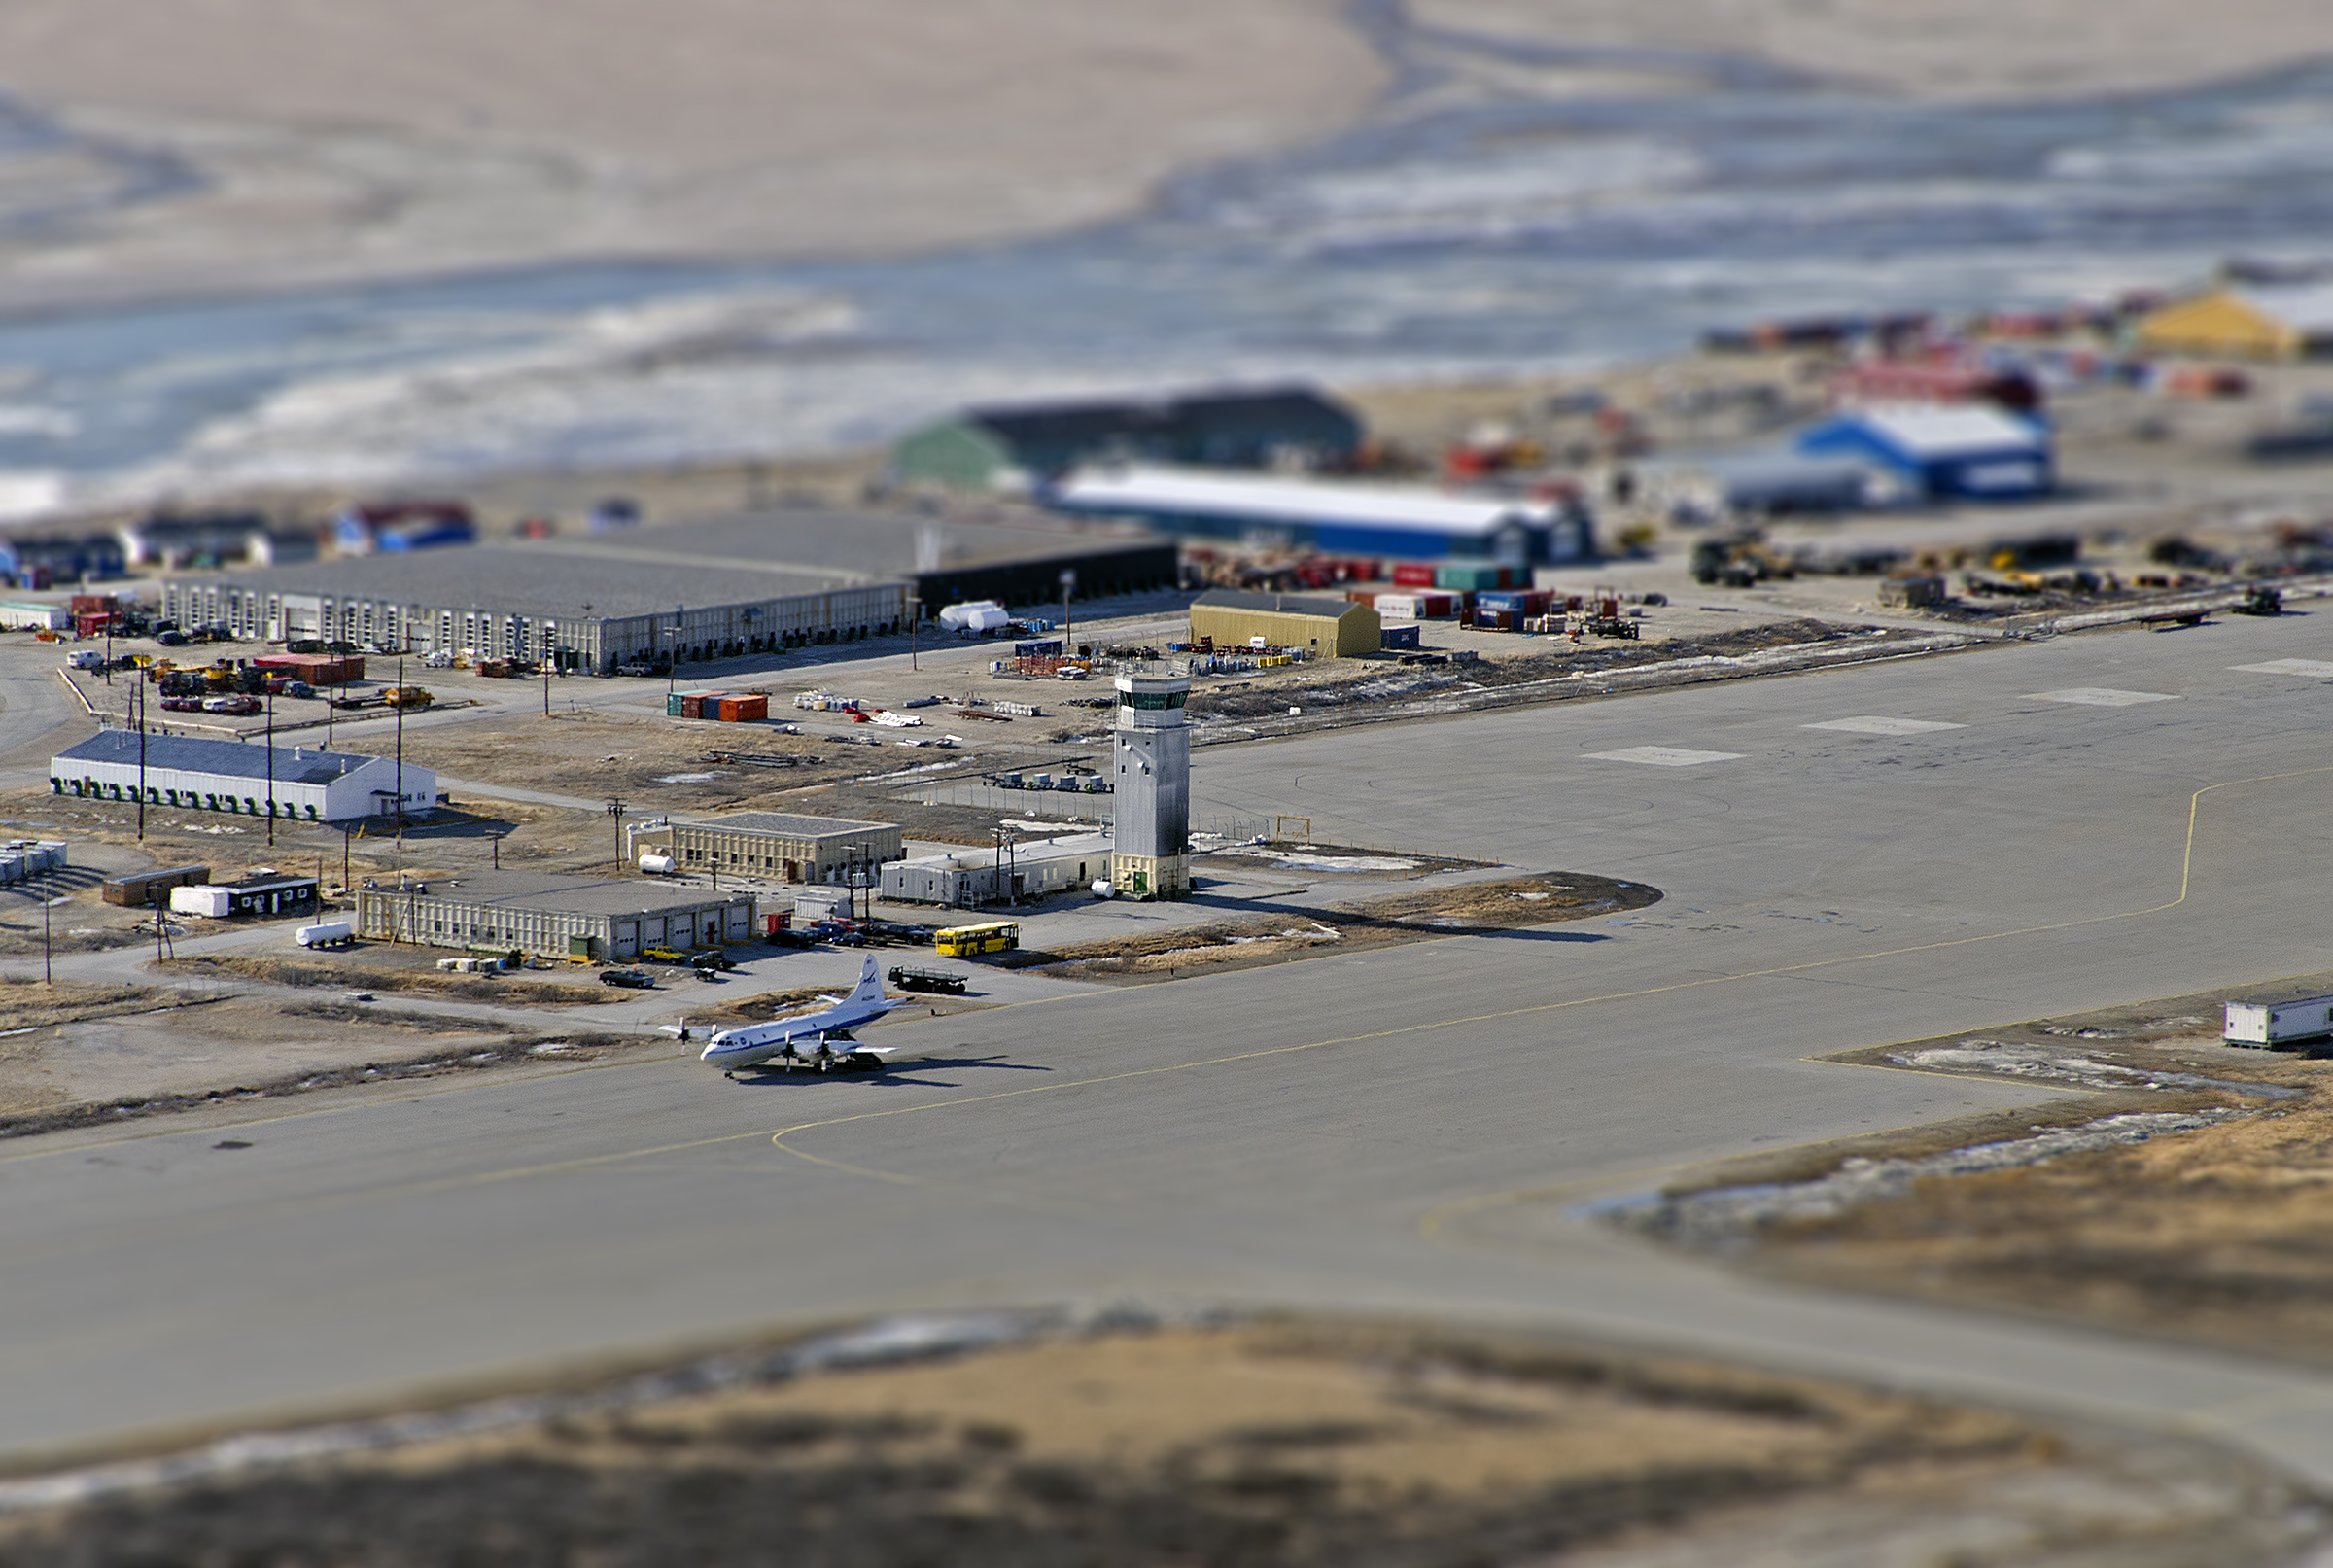 NASA's P-3B on Tarmac at Kangerlussuaq Airport | NASA: https://www.nasa.gov/mission_pages/icebridge/multimedia/spr13...